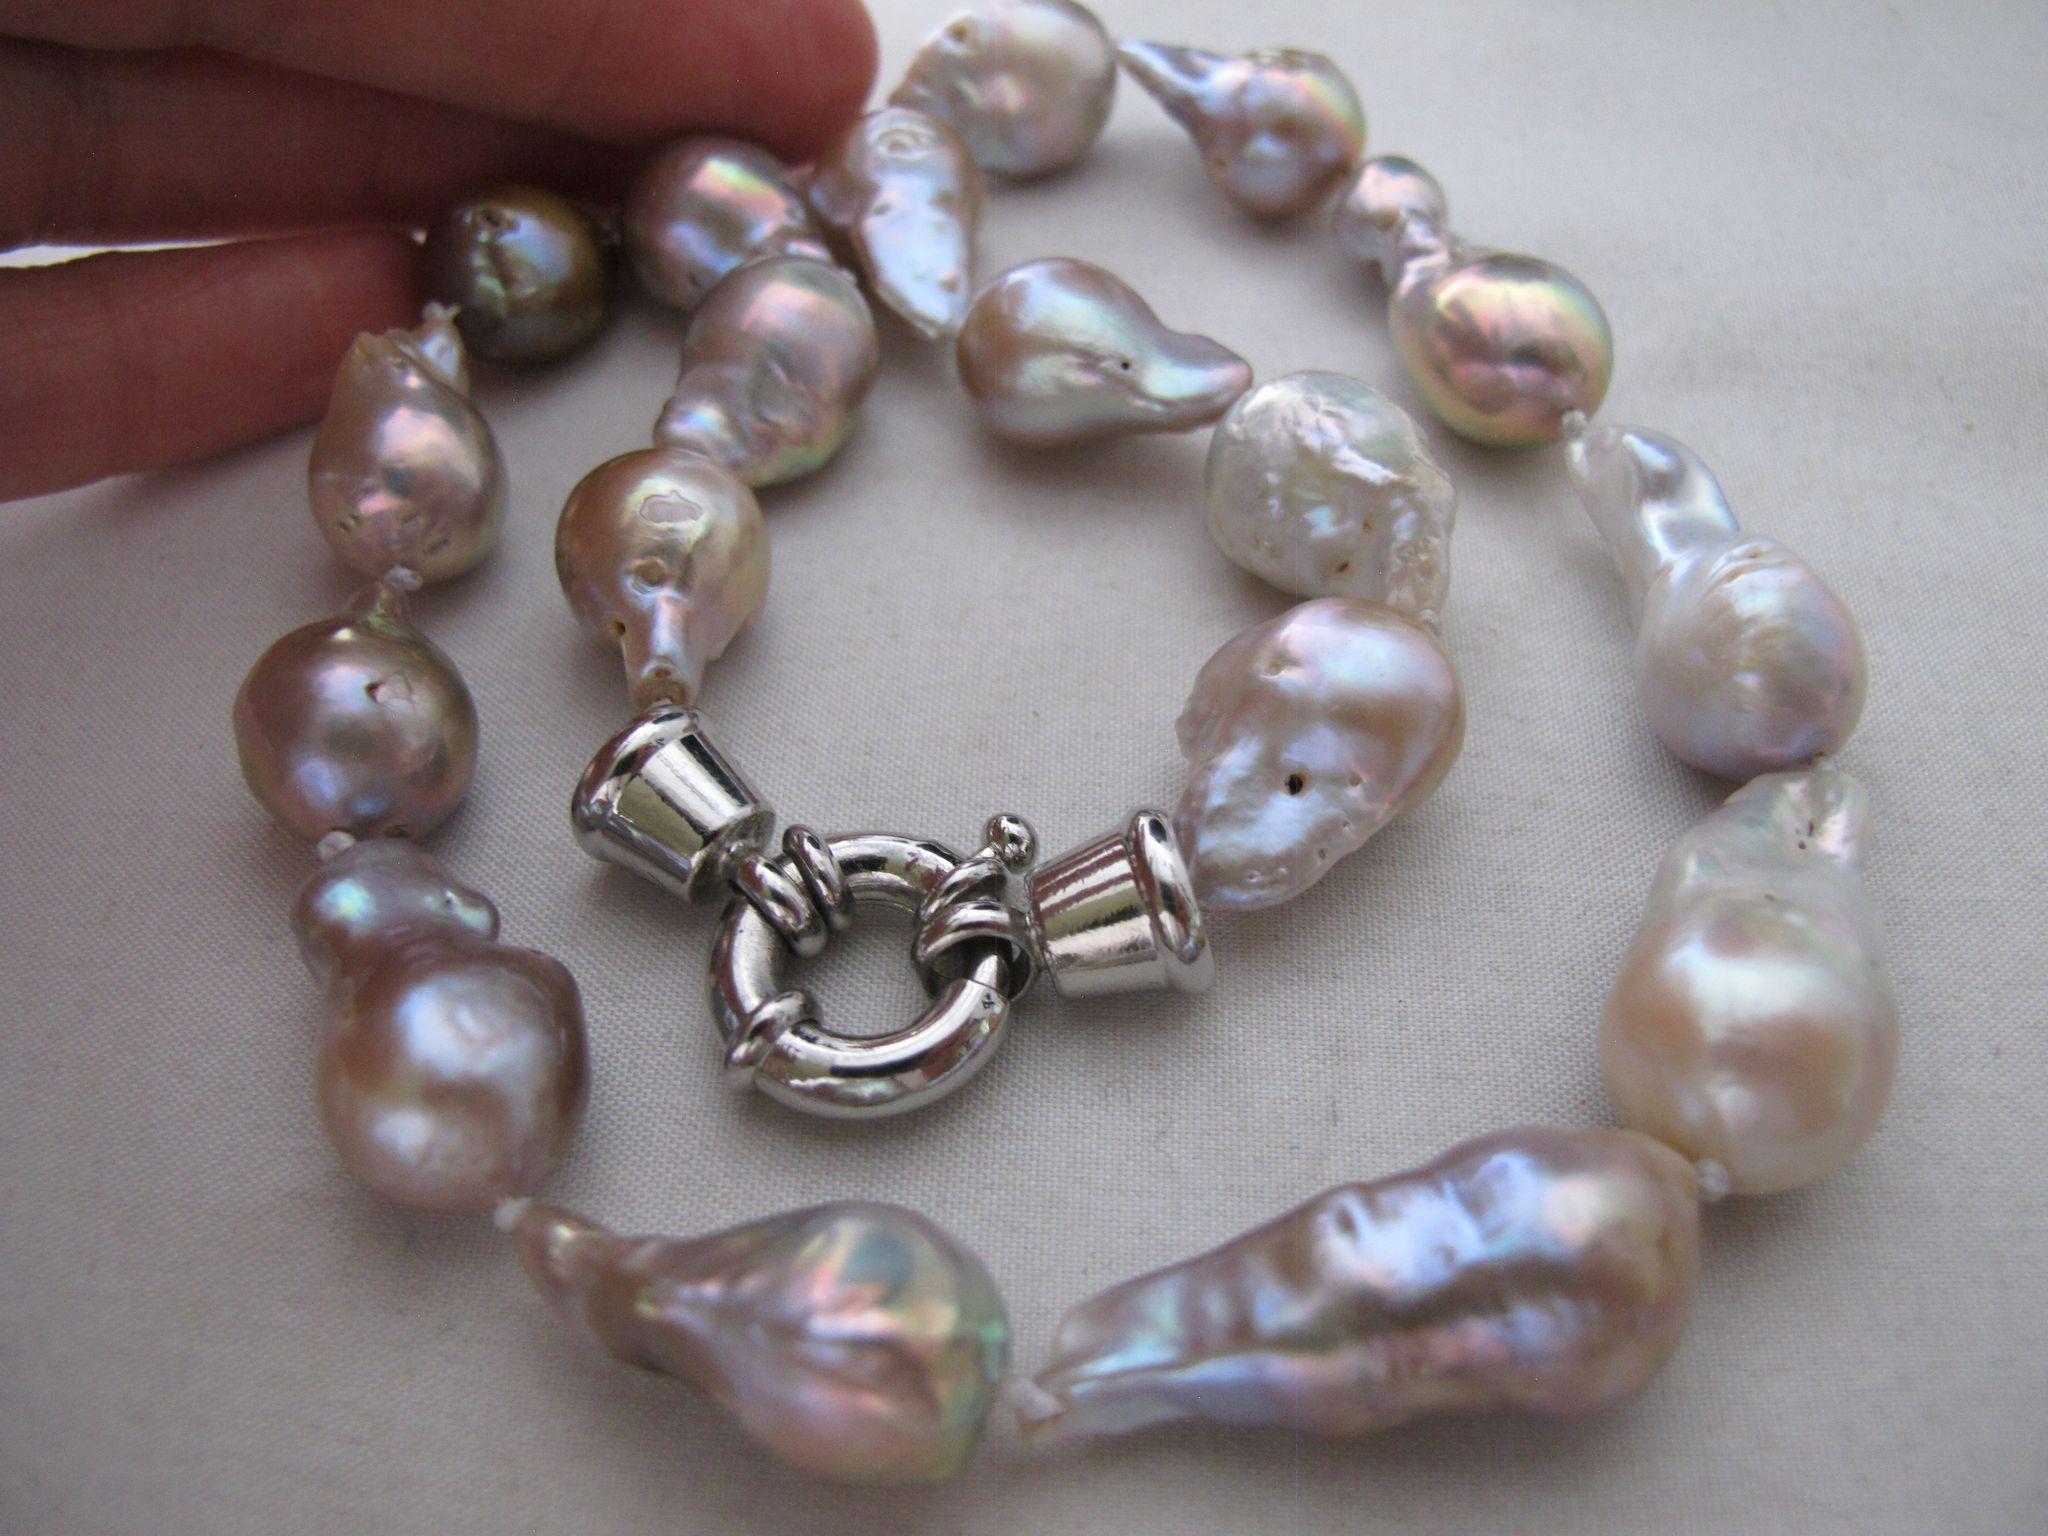 baroque art irregular pearl Hengsheng freshwater baroque pearl choker necklace irregular pearl leather cord bead dark peach large hole baroque freshwater pearls have baroque pearl.